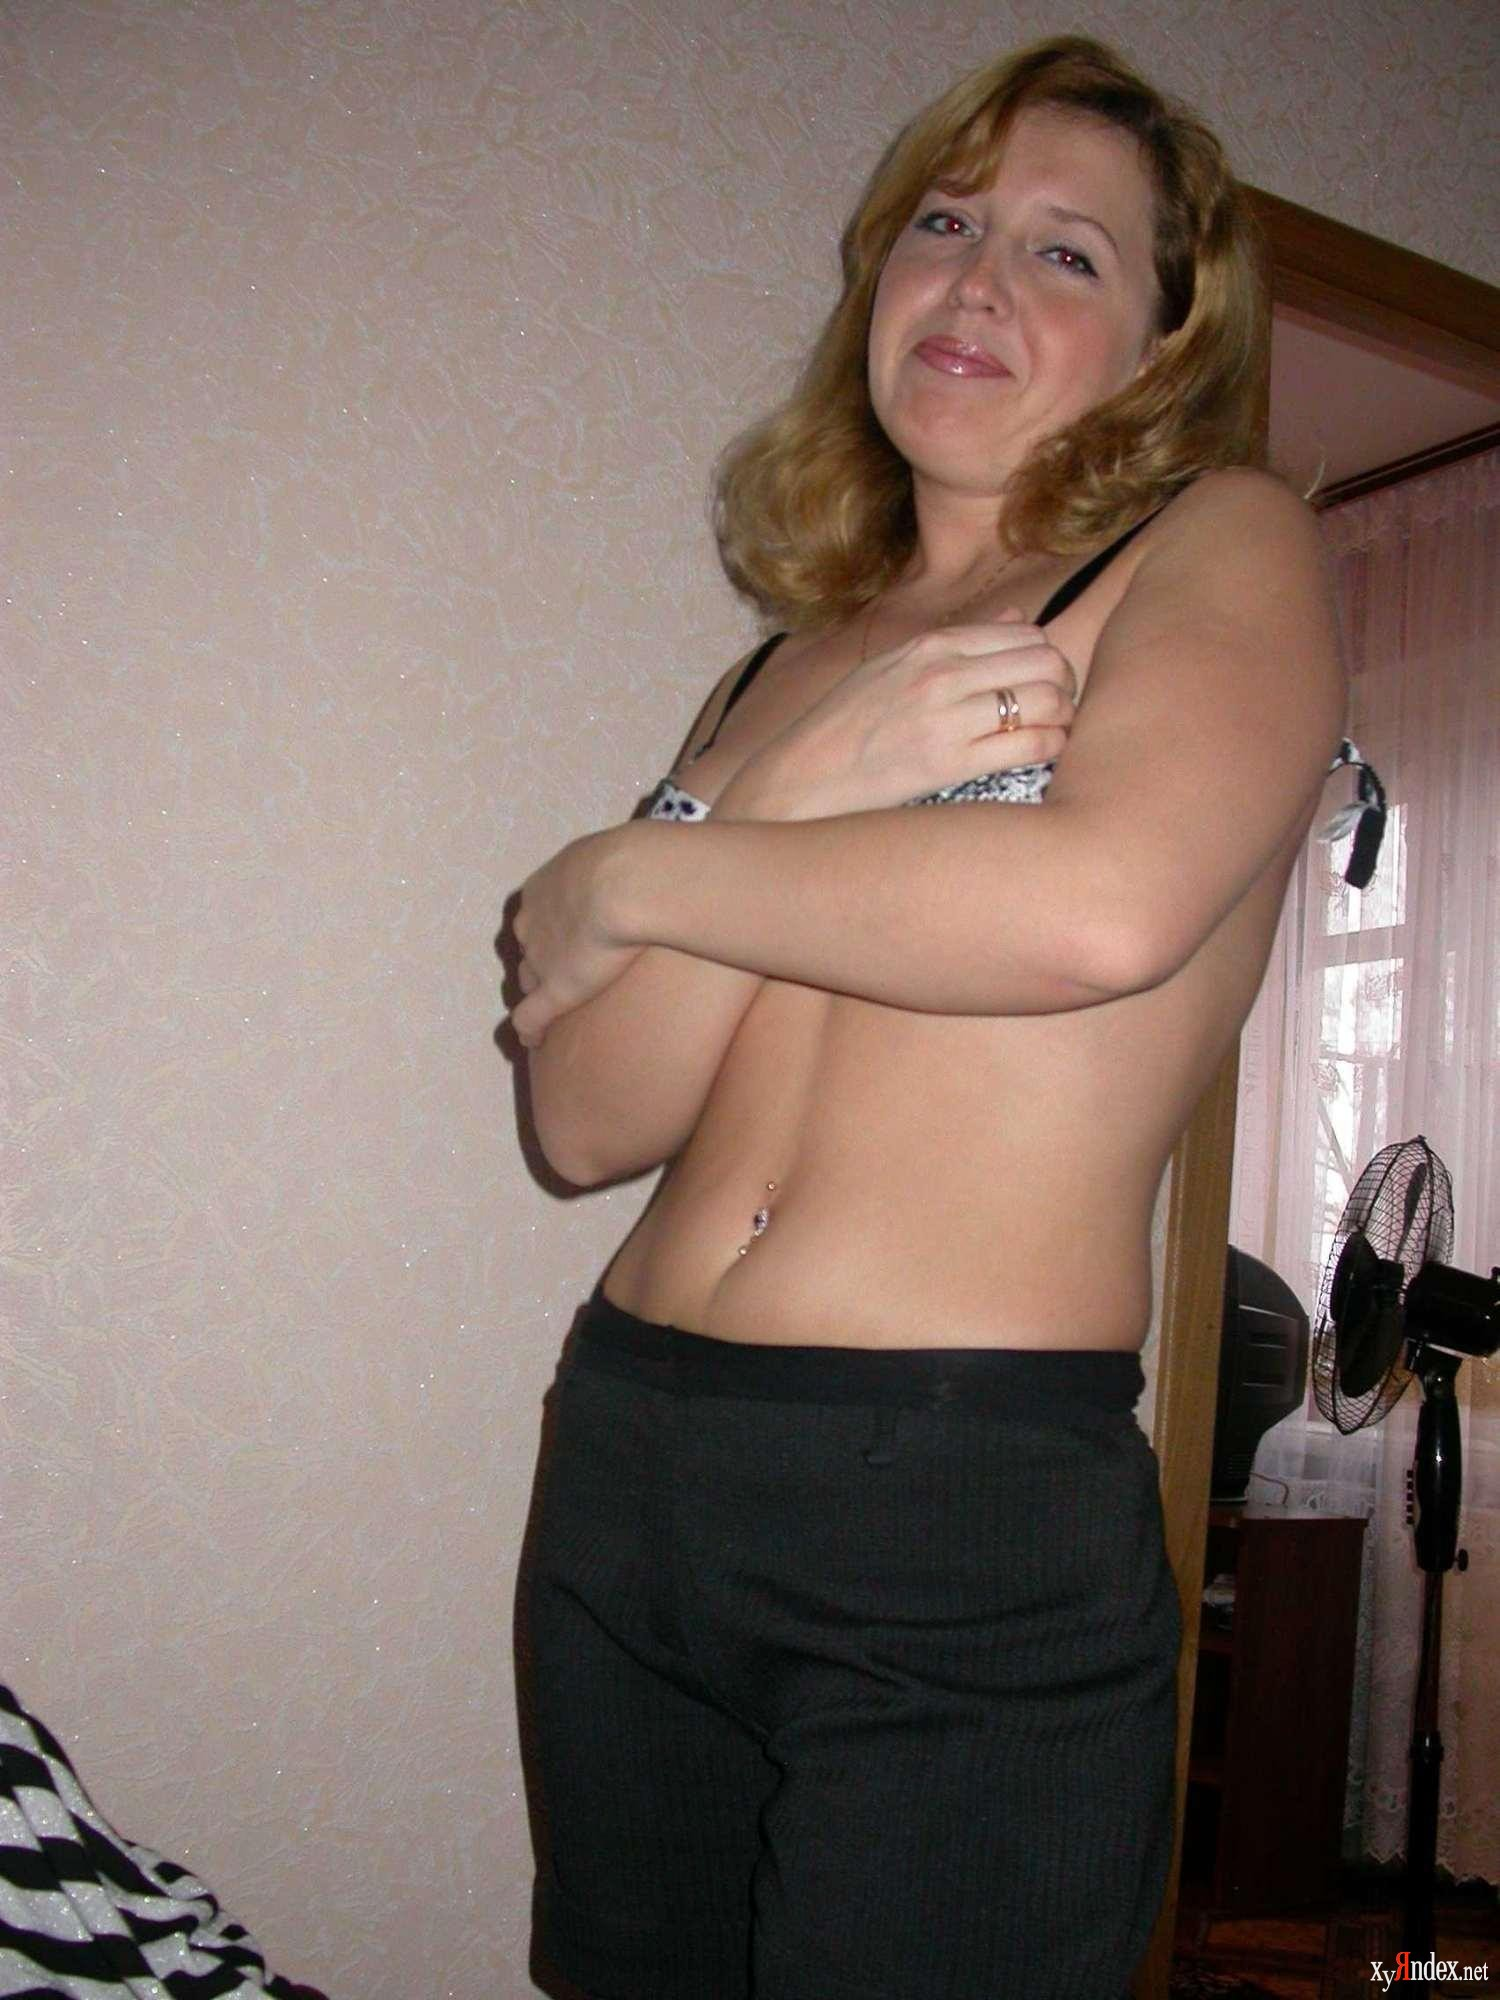 Фигуристая голая мамочка 22 фотография